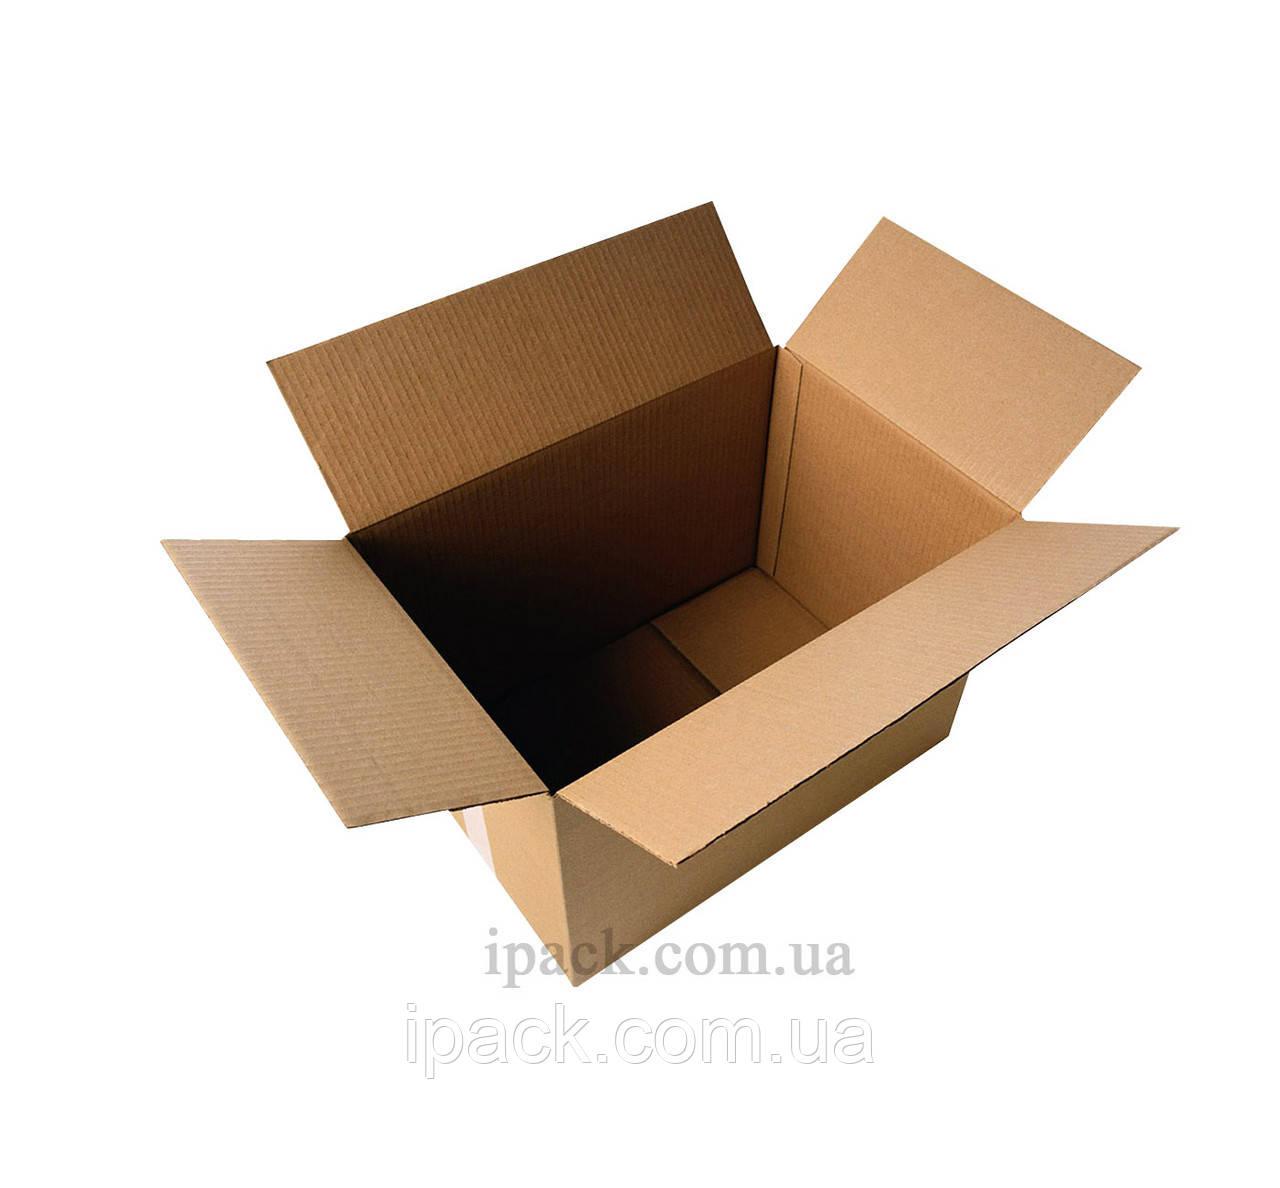 Гофроящик 400*270*237 мм бурый четырехклапанный картонный короб